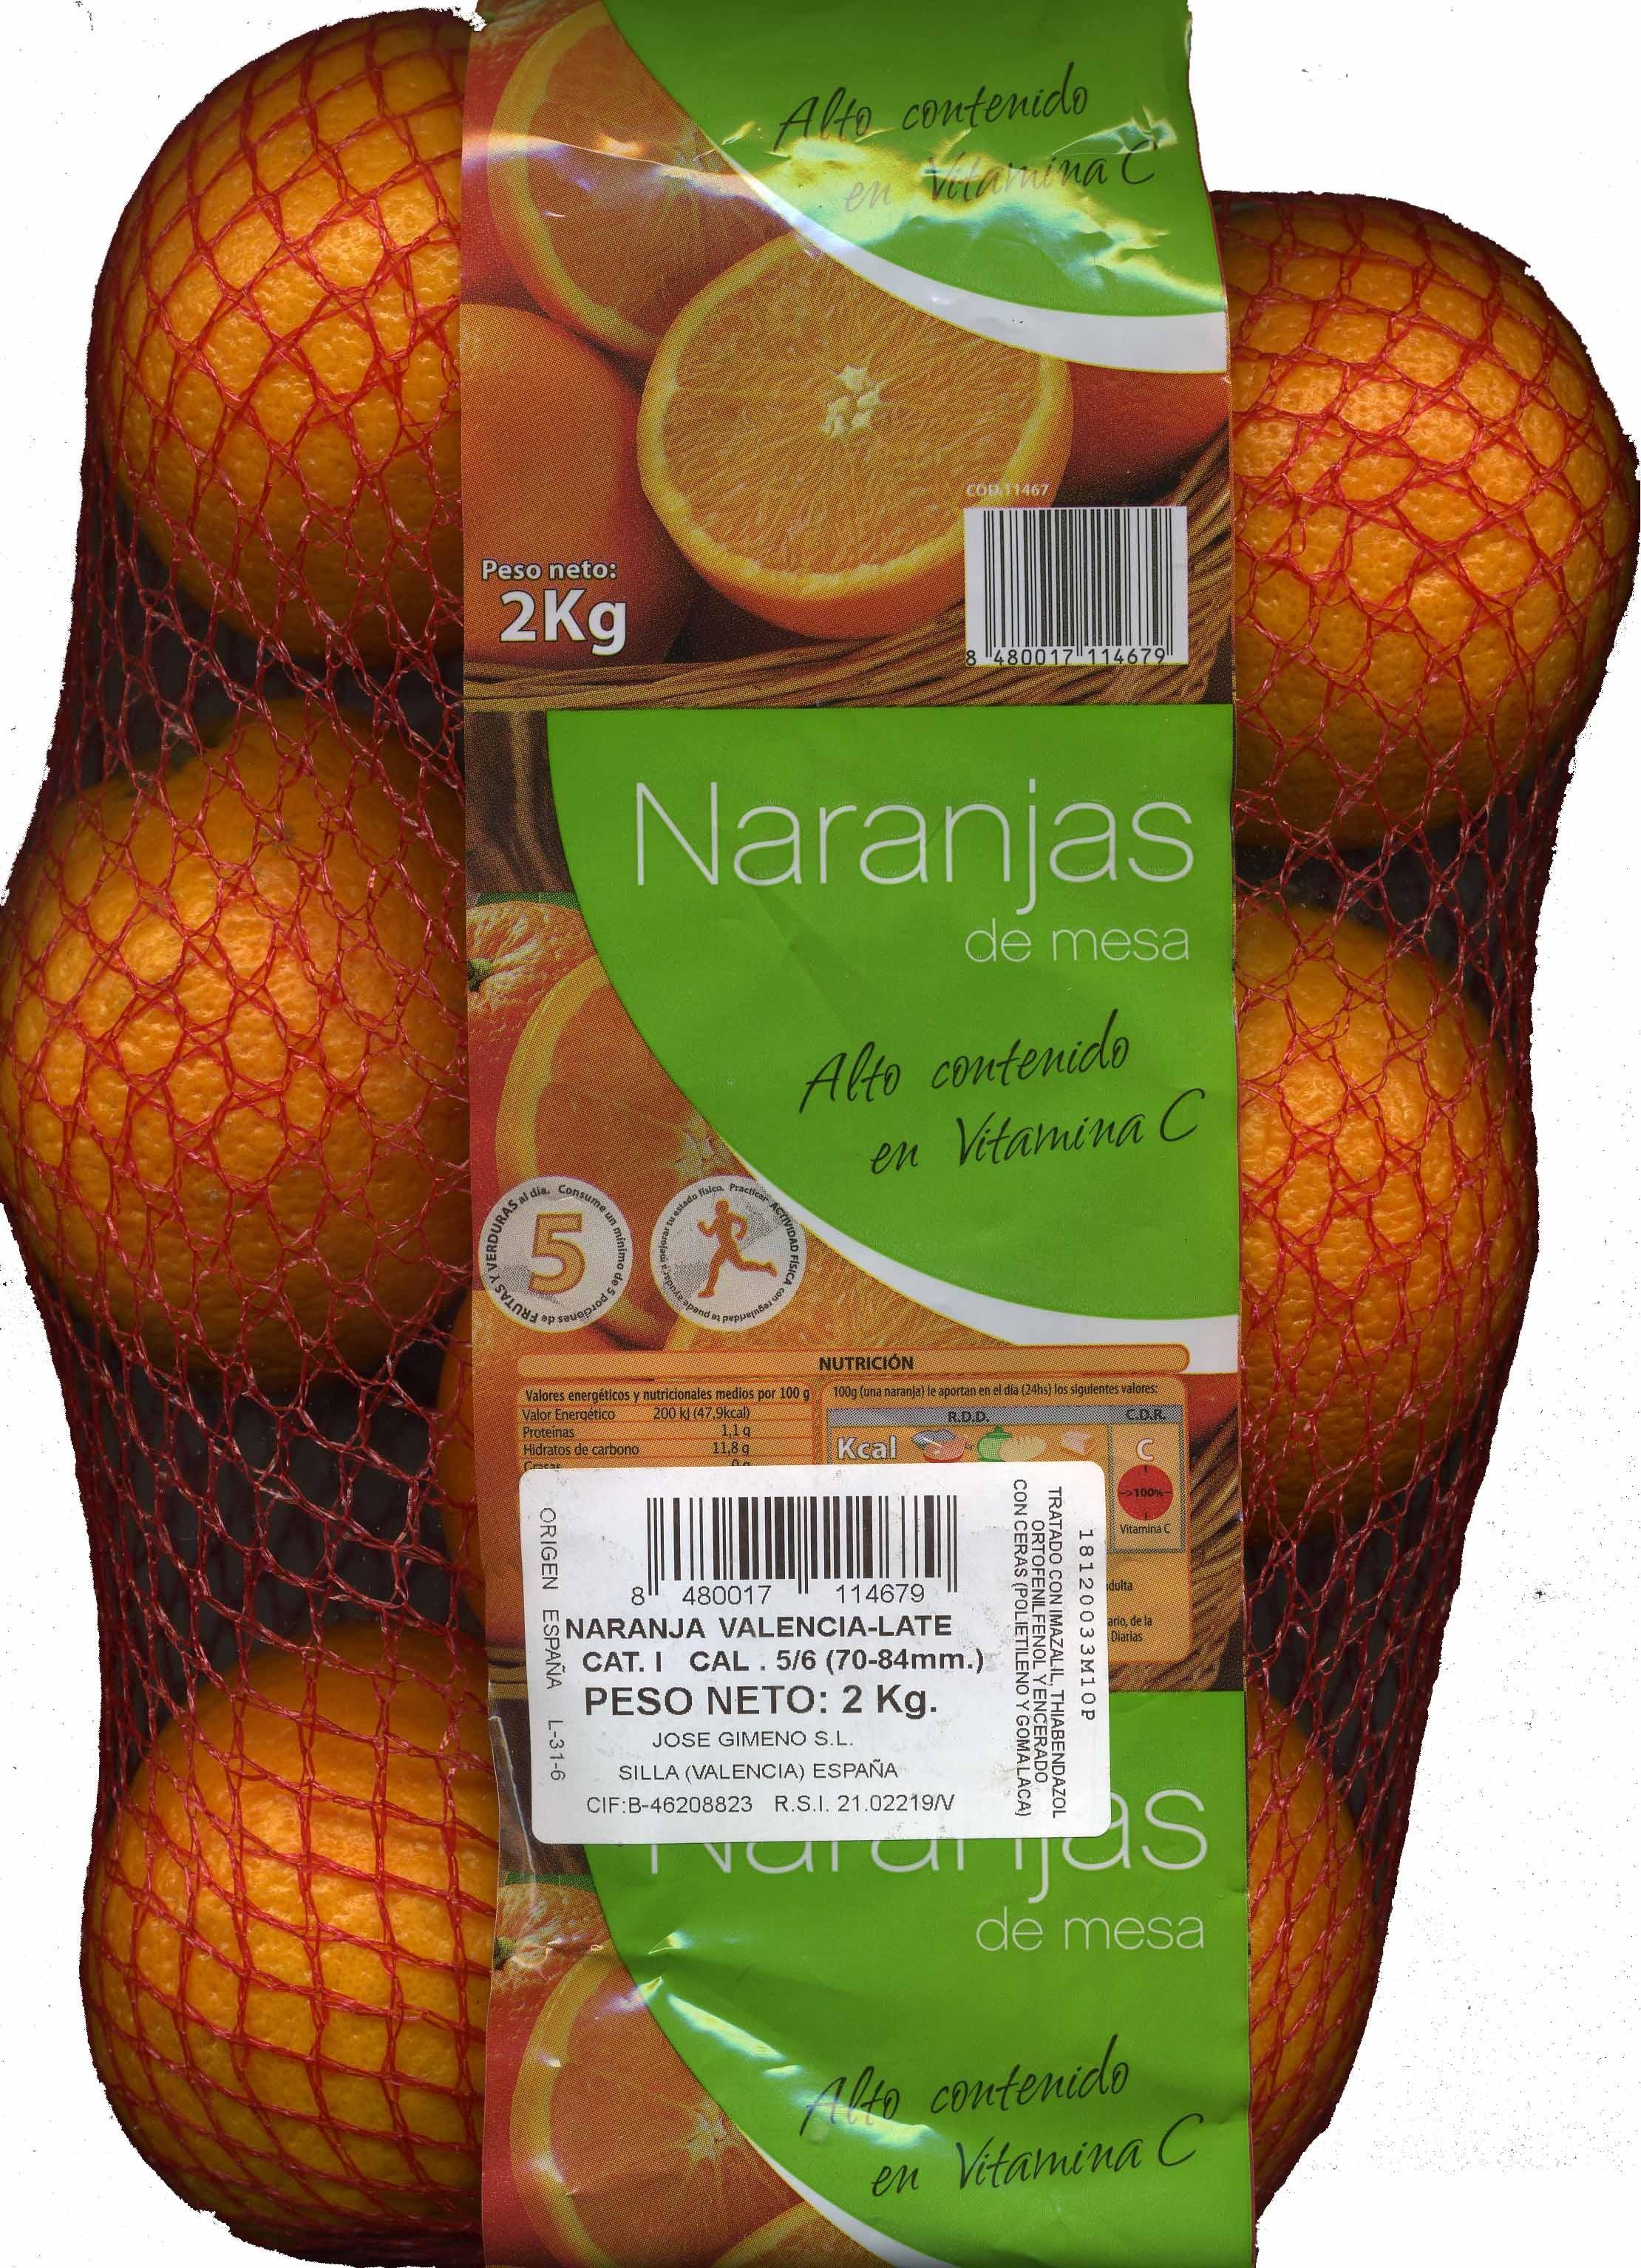 Naranjas de mesa - Producto - es